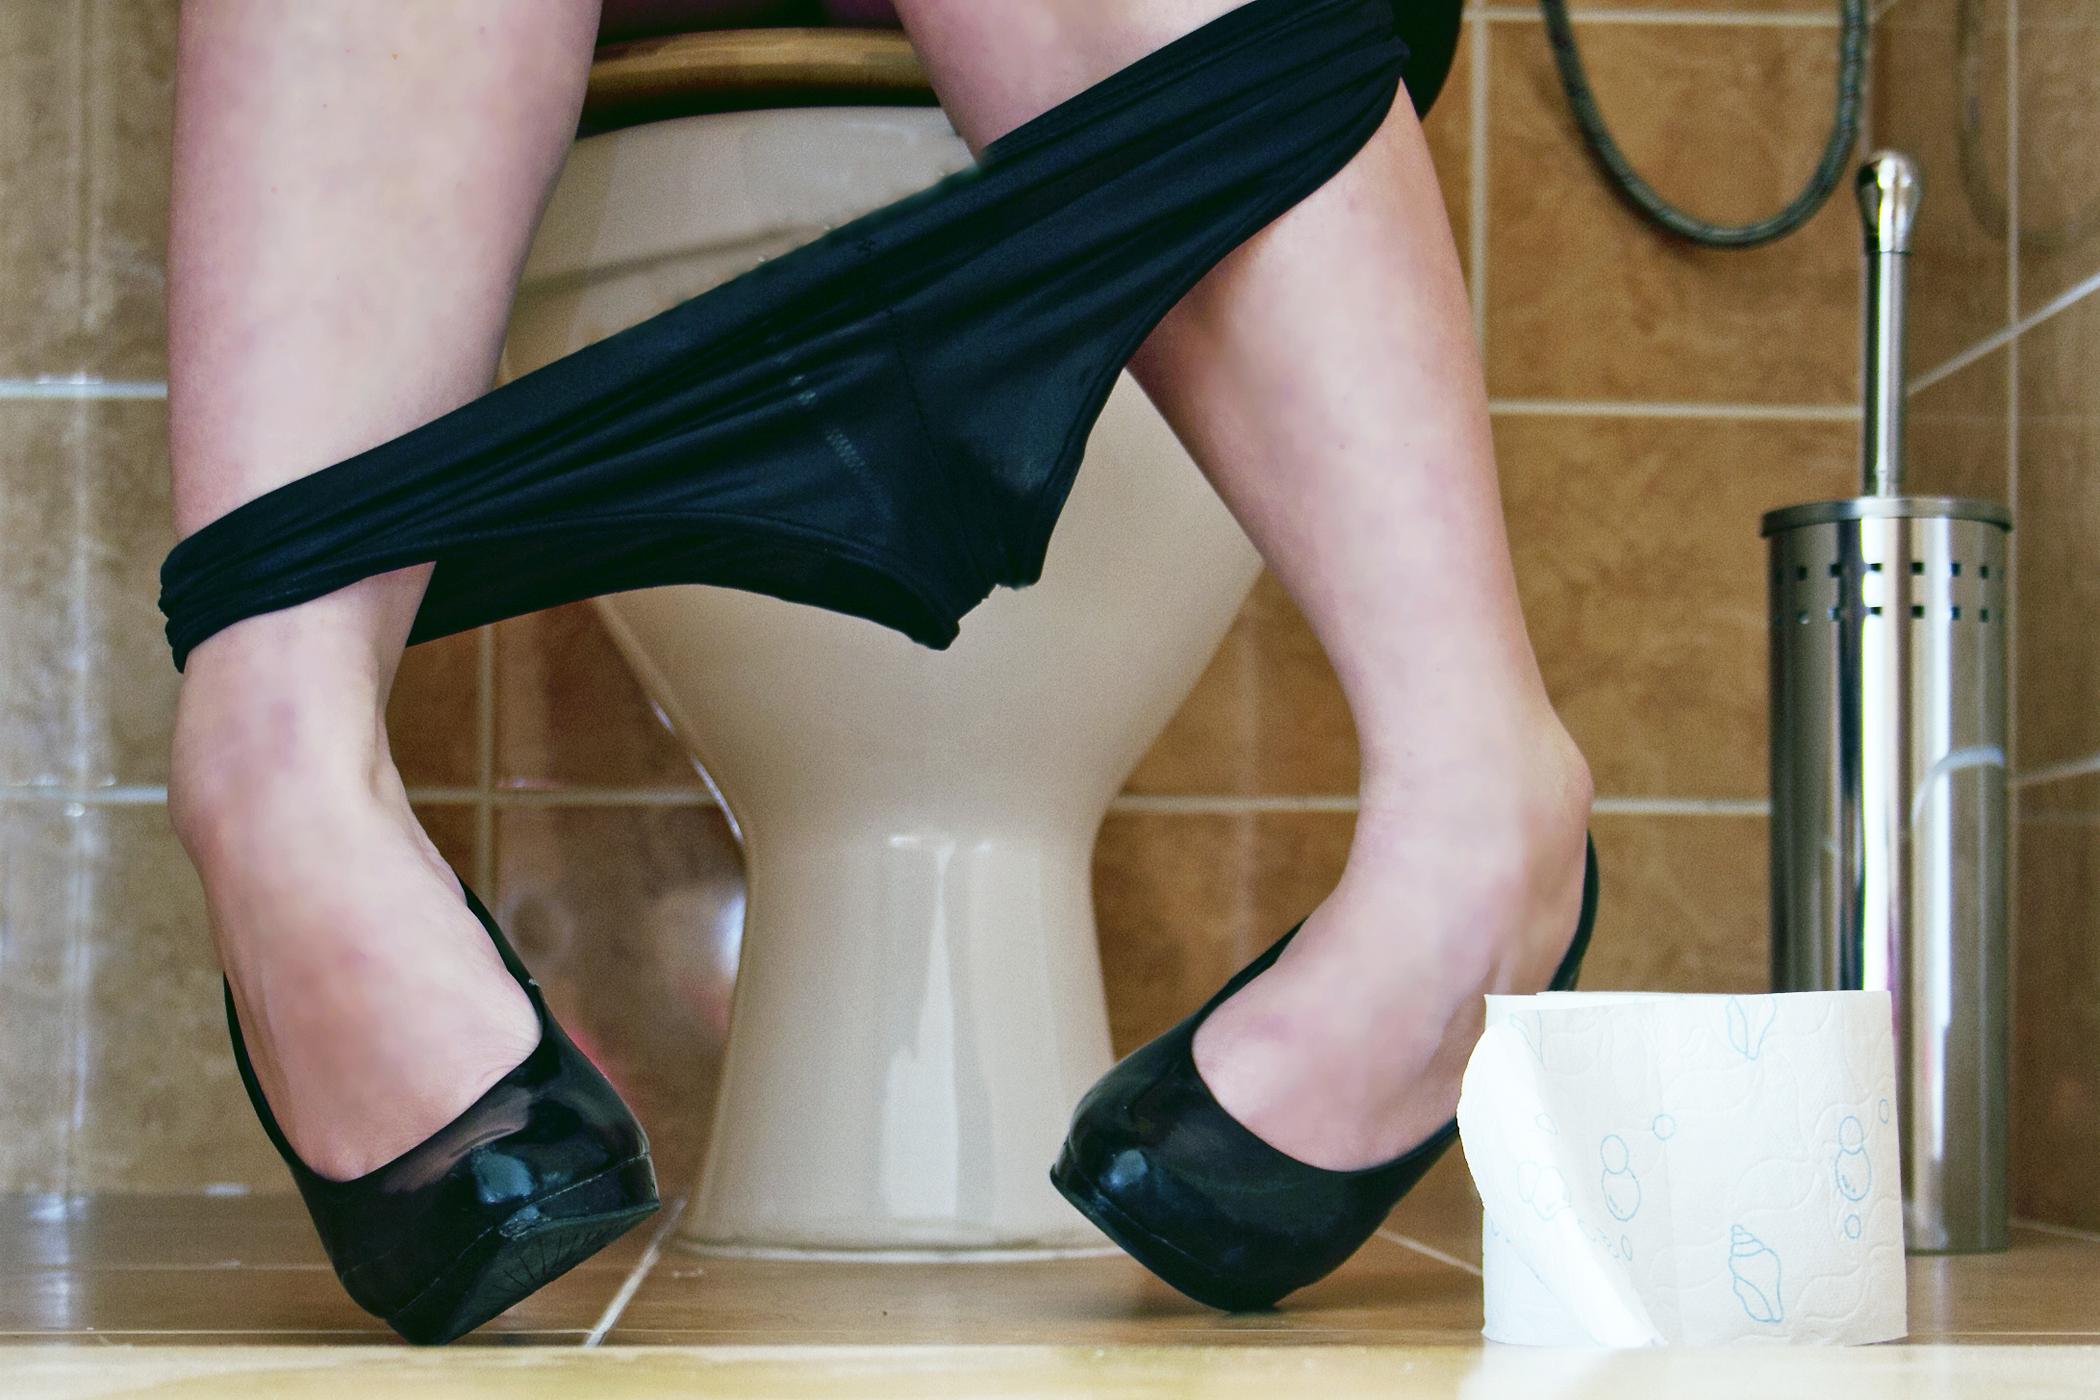 prekrasnie-ledi-pisayut-v-tualete-kinoteatra